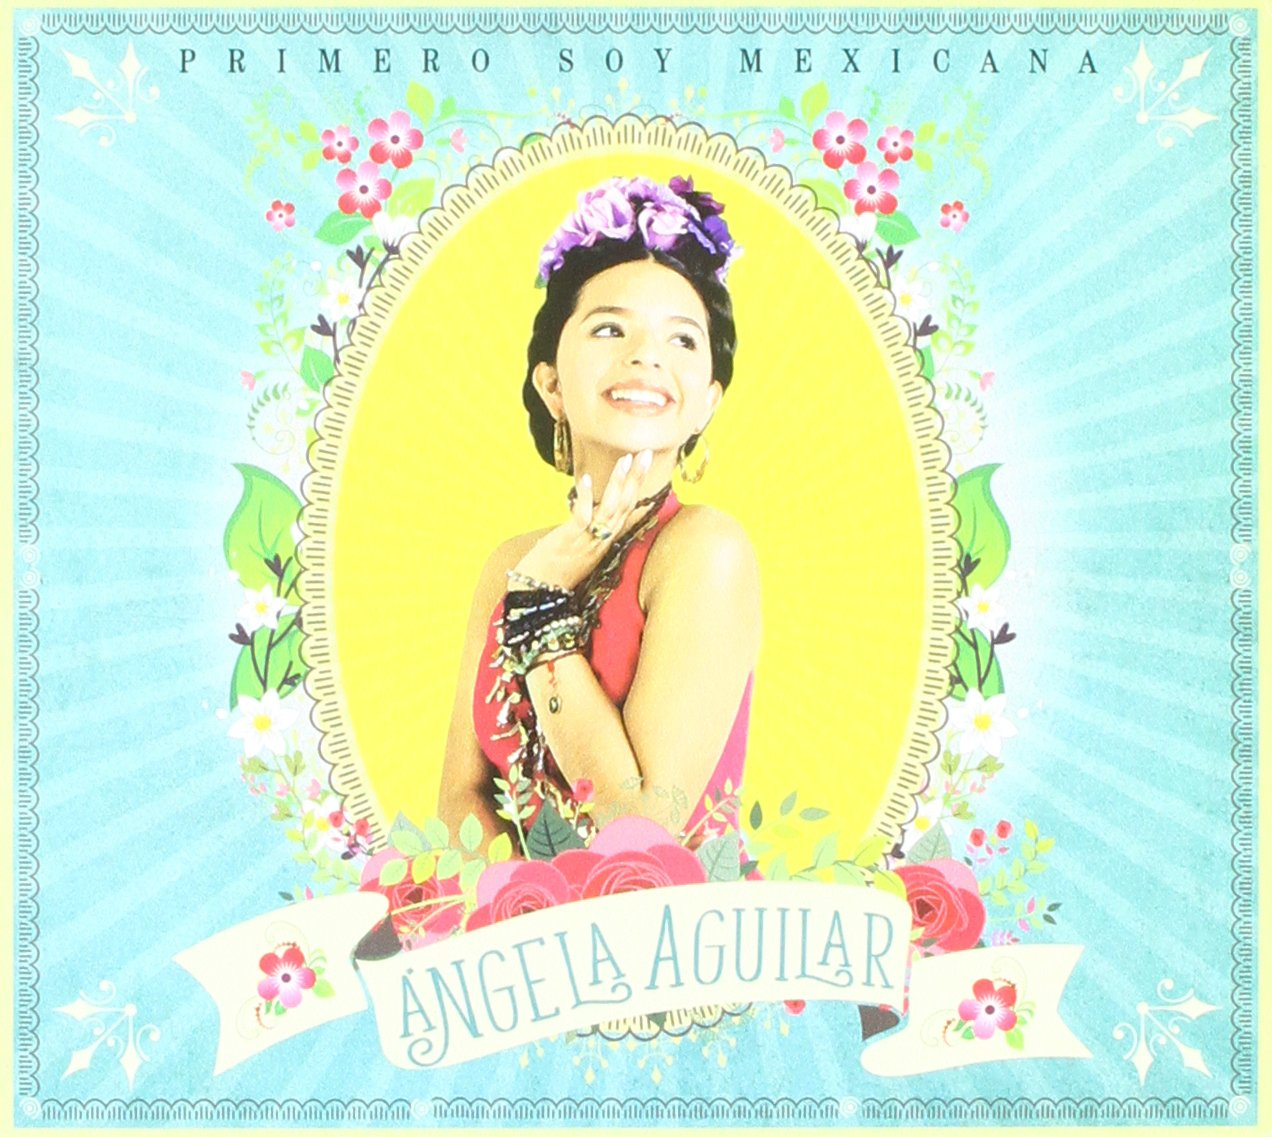 CD : Angela Aguilar - Primero Soy Mexicana (CD)